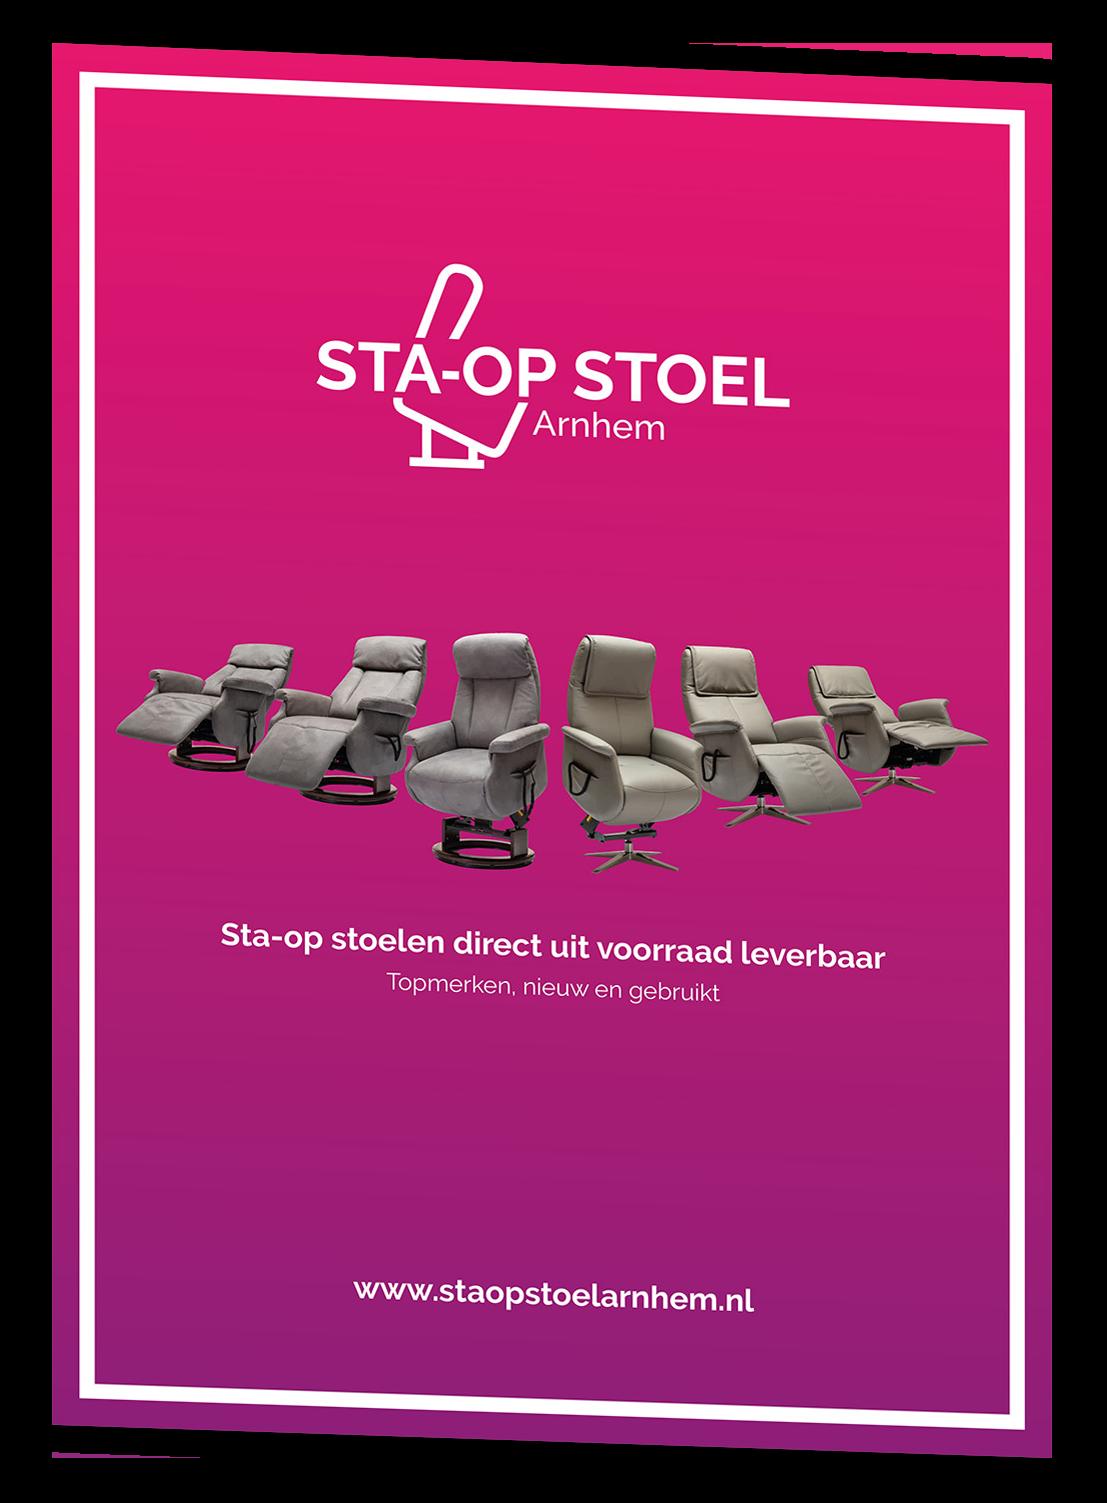 Brochure Sta-op Stoel Arnhem